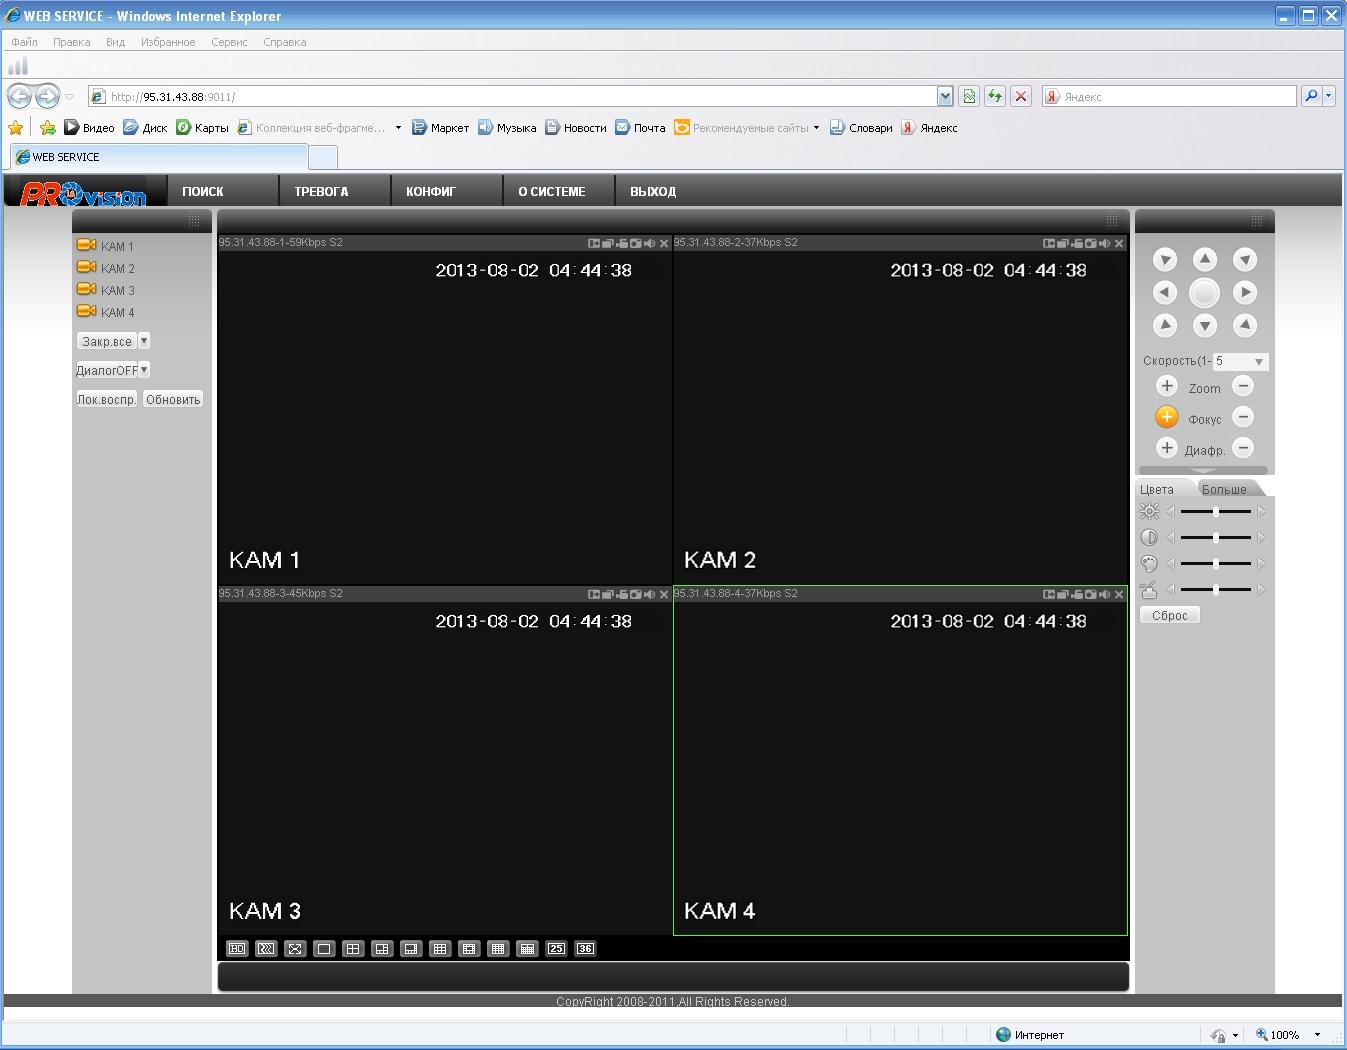 Онлайн трасляция видеонаблюдения через интернет